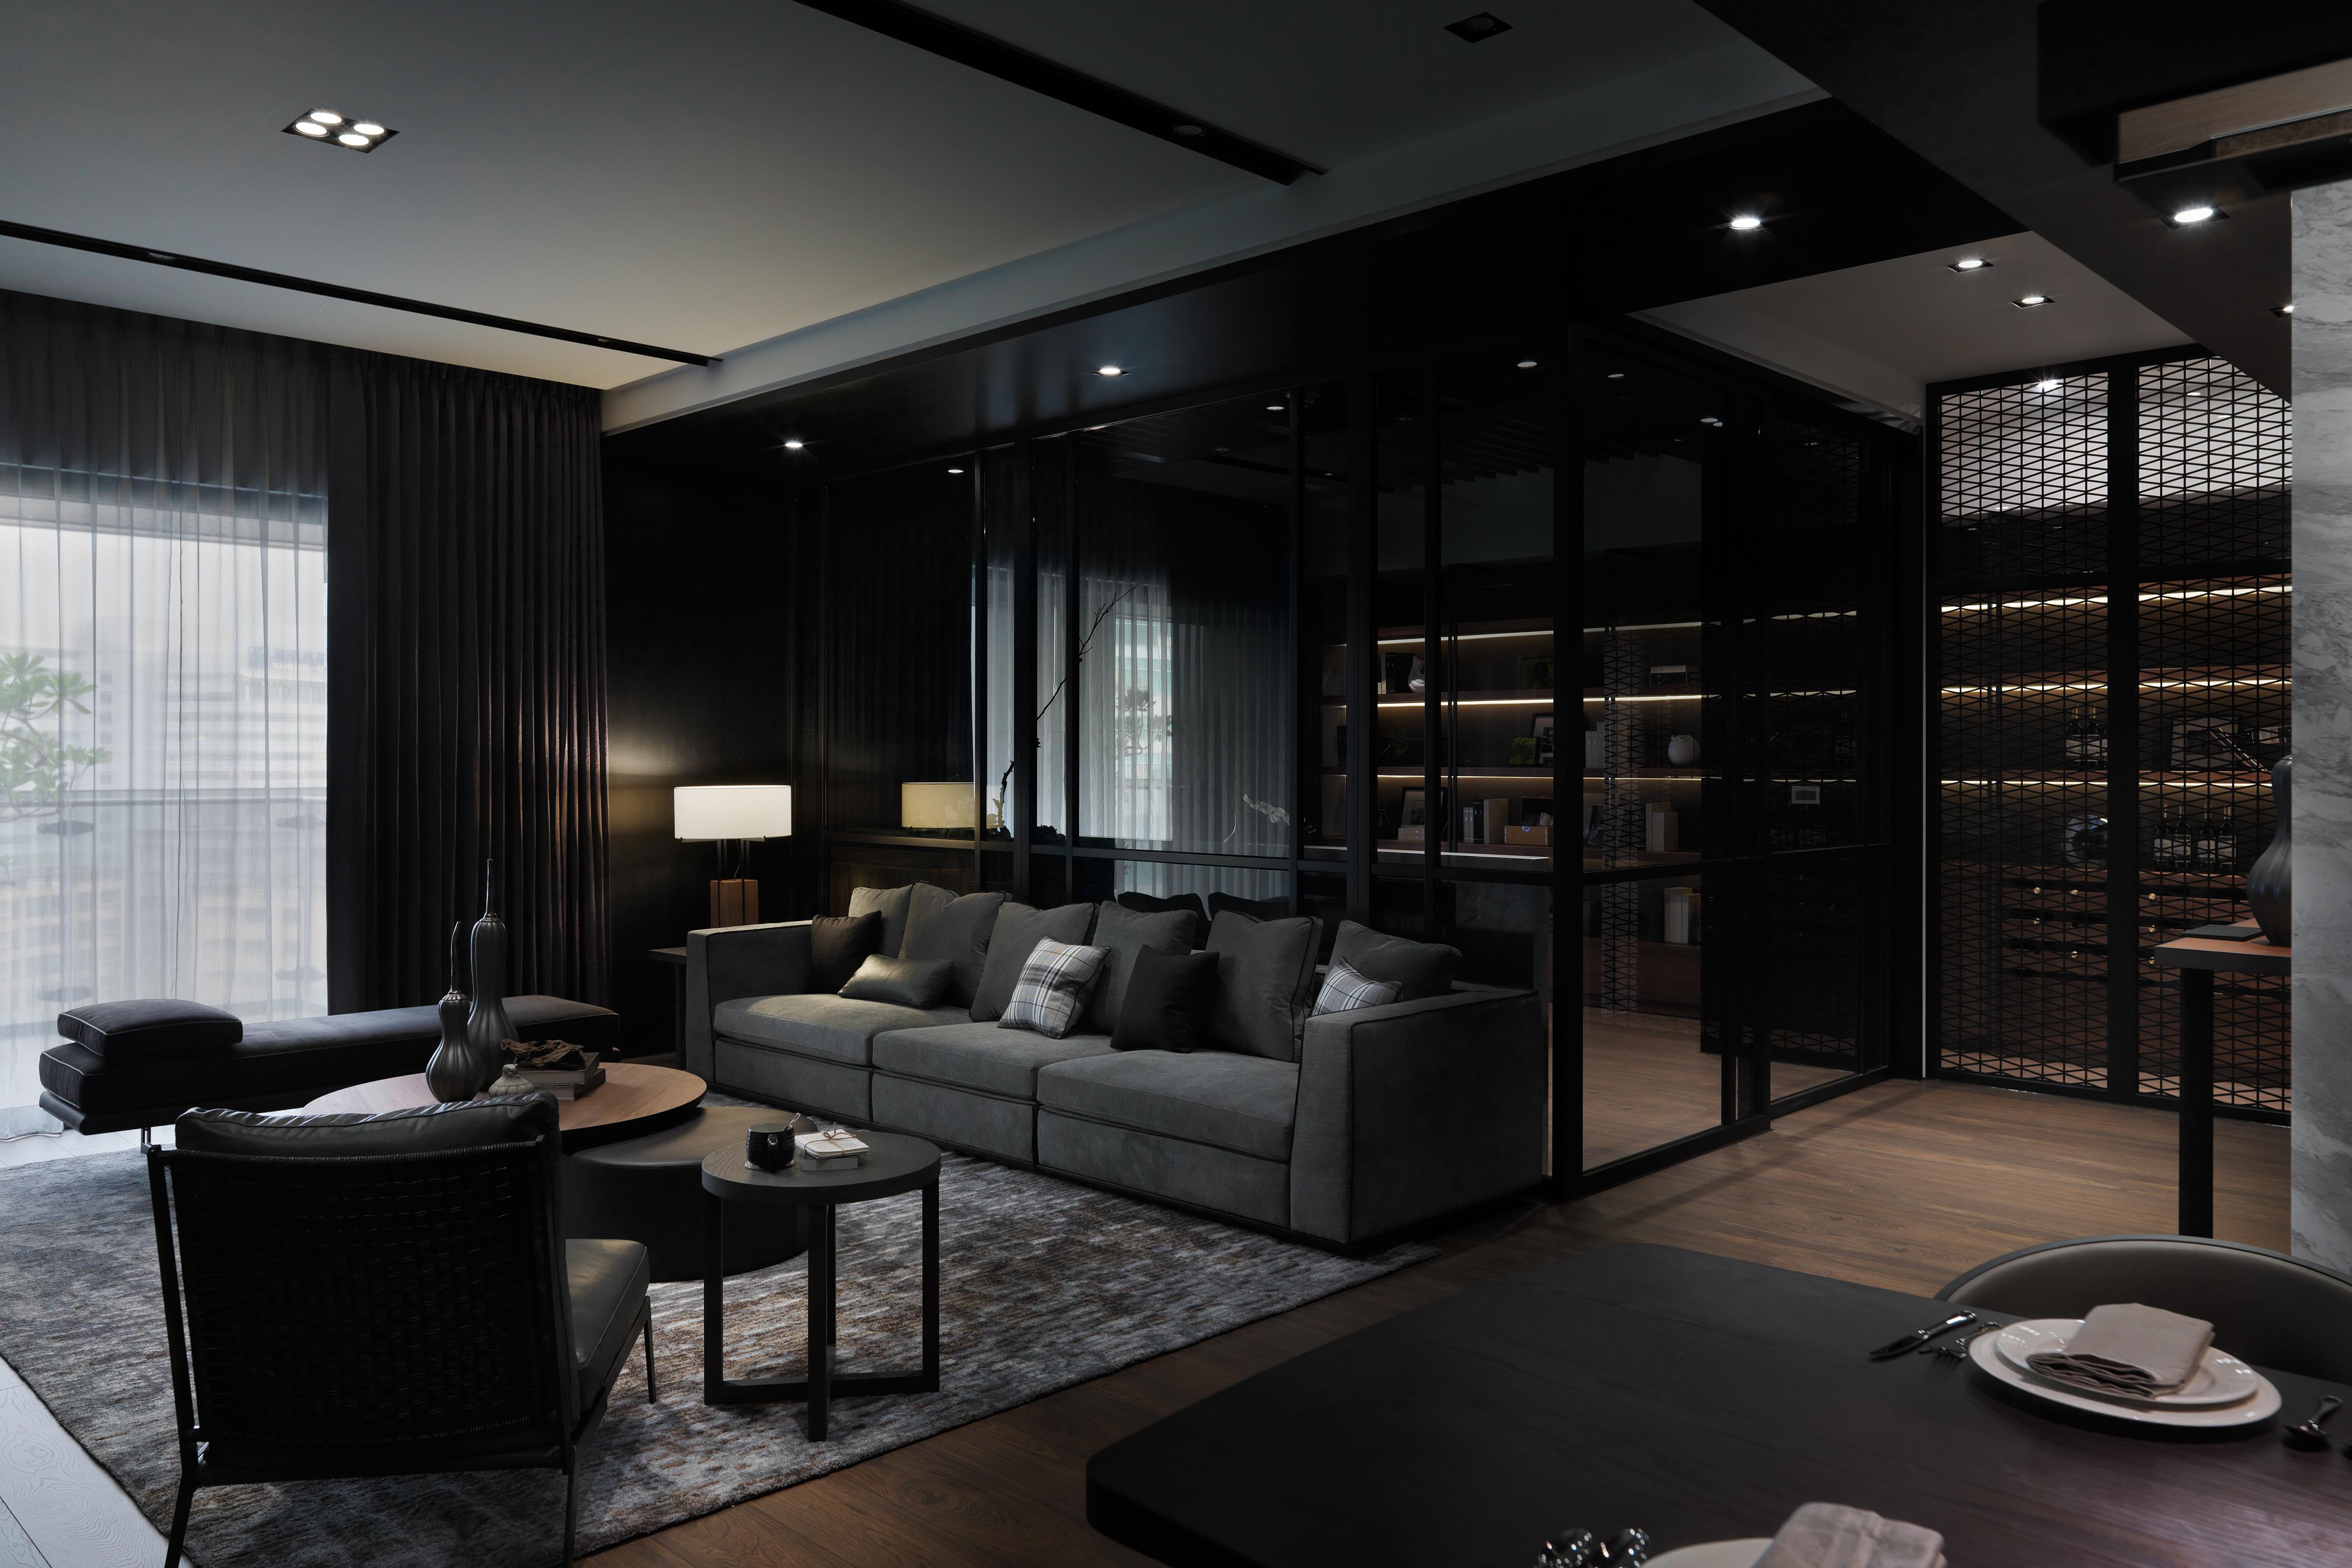 Rhythm land residential house - Rhythm in interior design ...